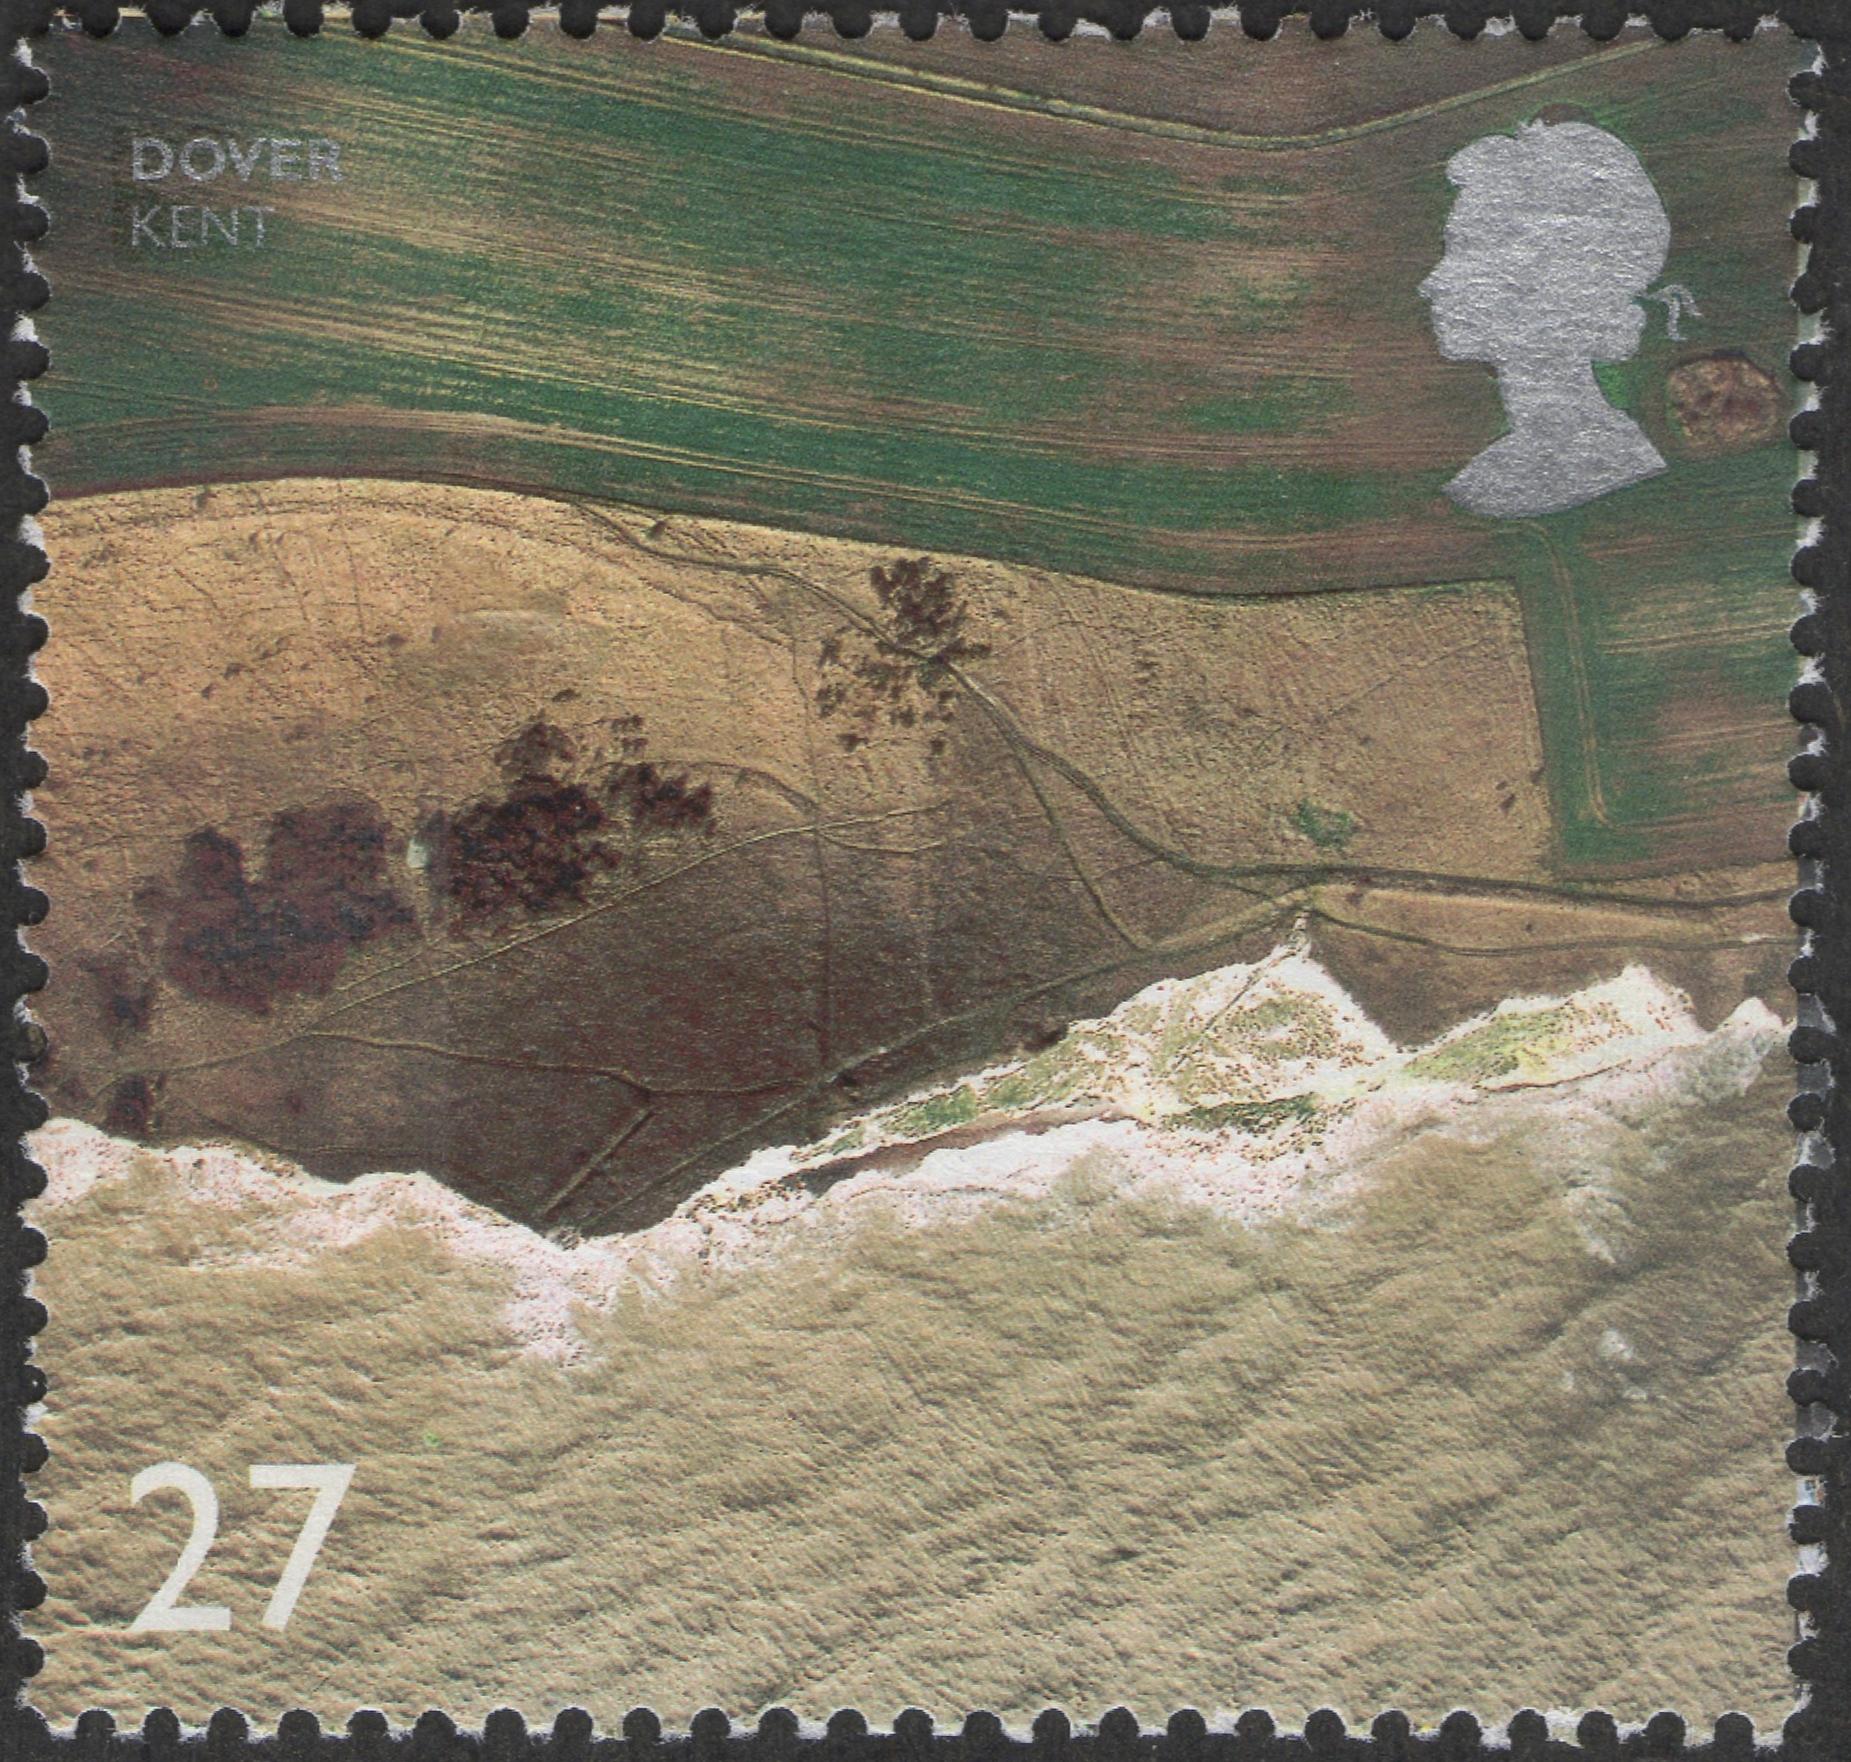 Great Britain - Scott #2031 (2002)